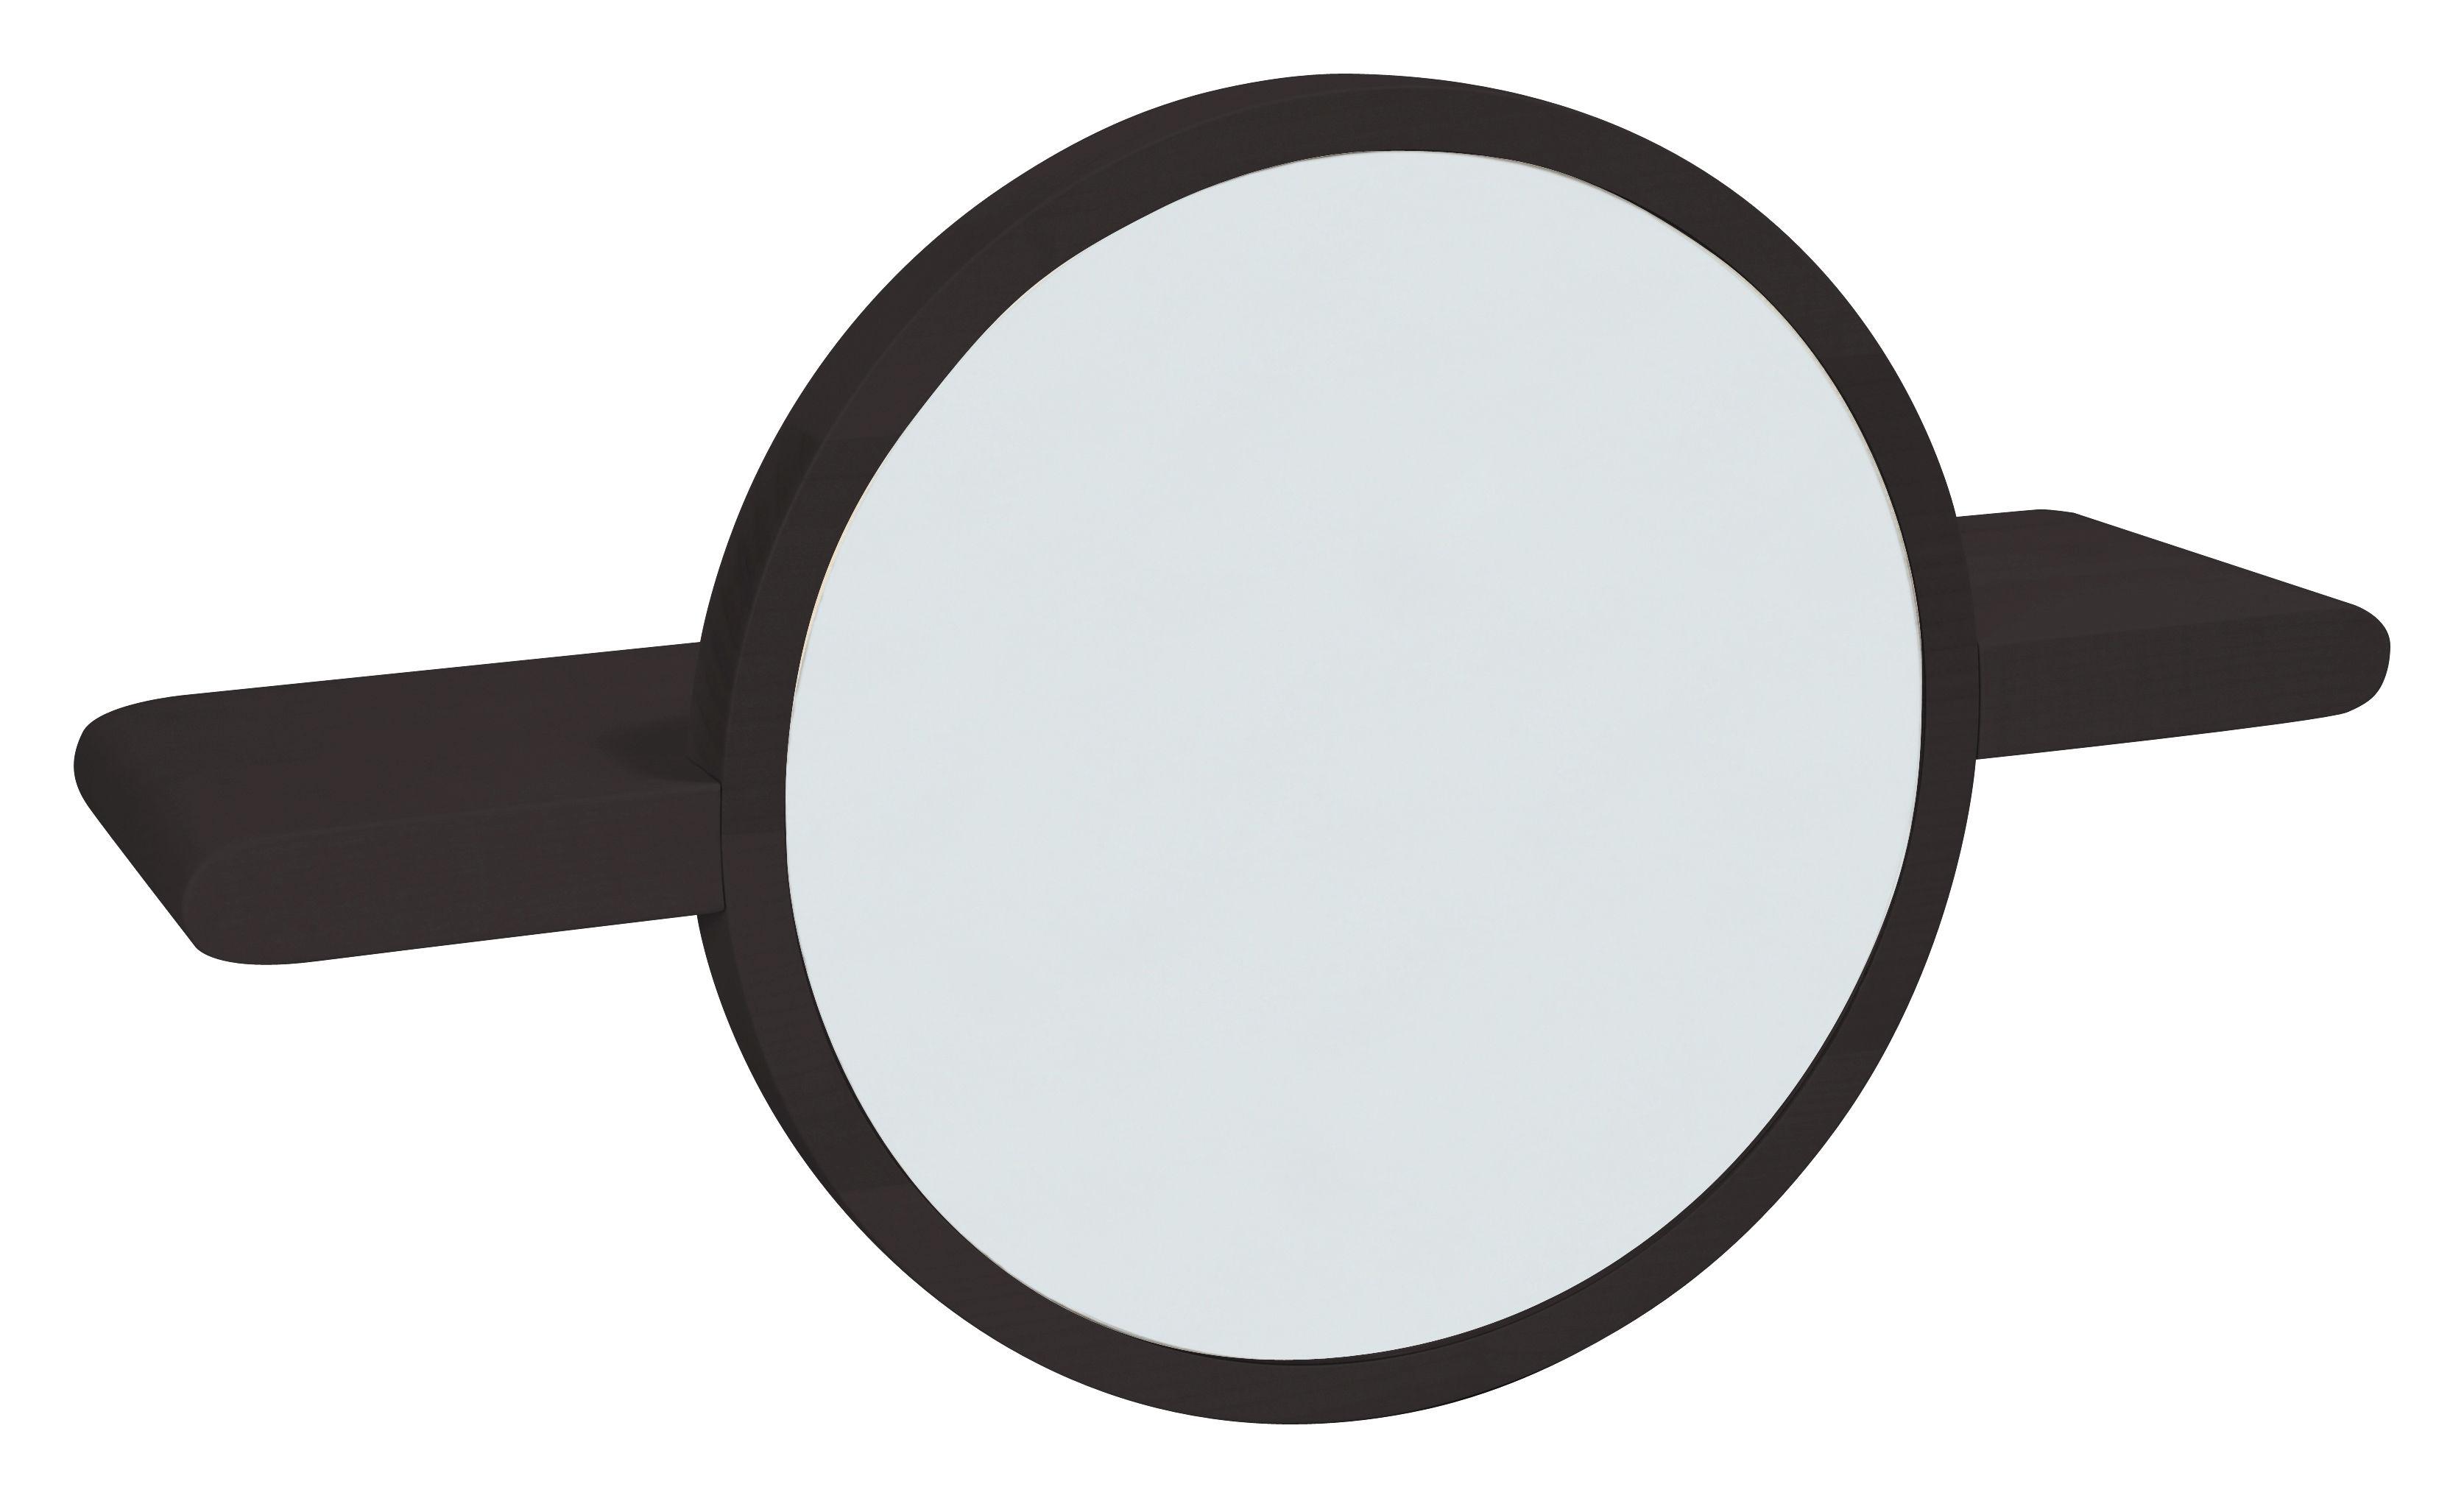 etag re mirette miroir rond l 60 cm brun made in. Black Bedroom Furniture Sets. Home Design Ideas